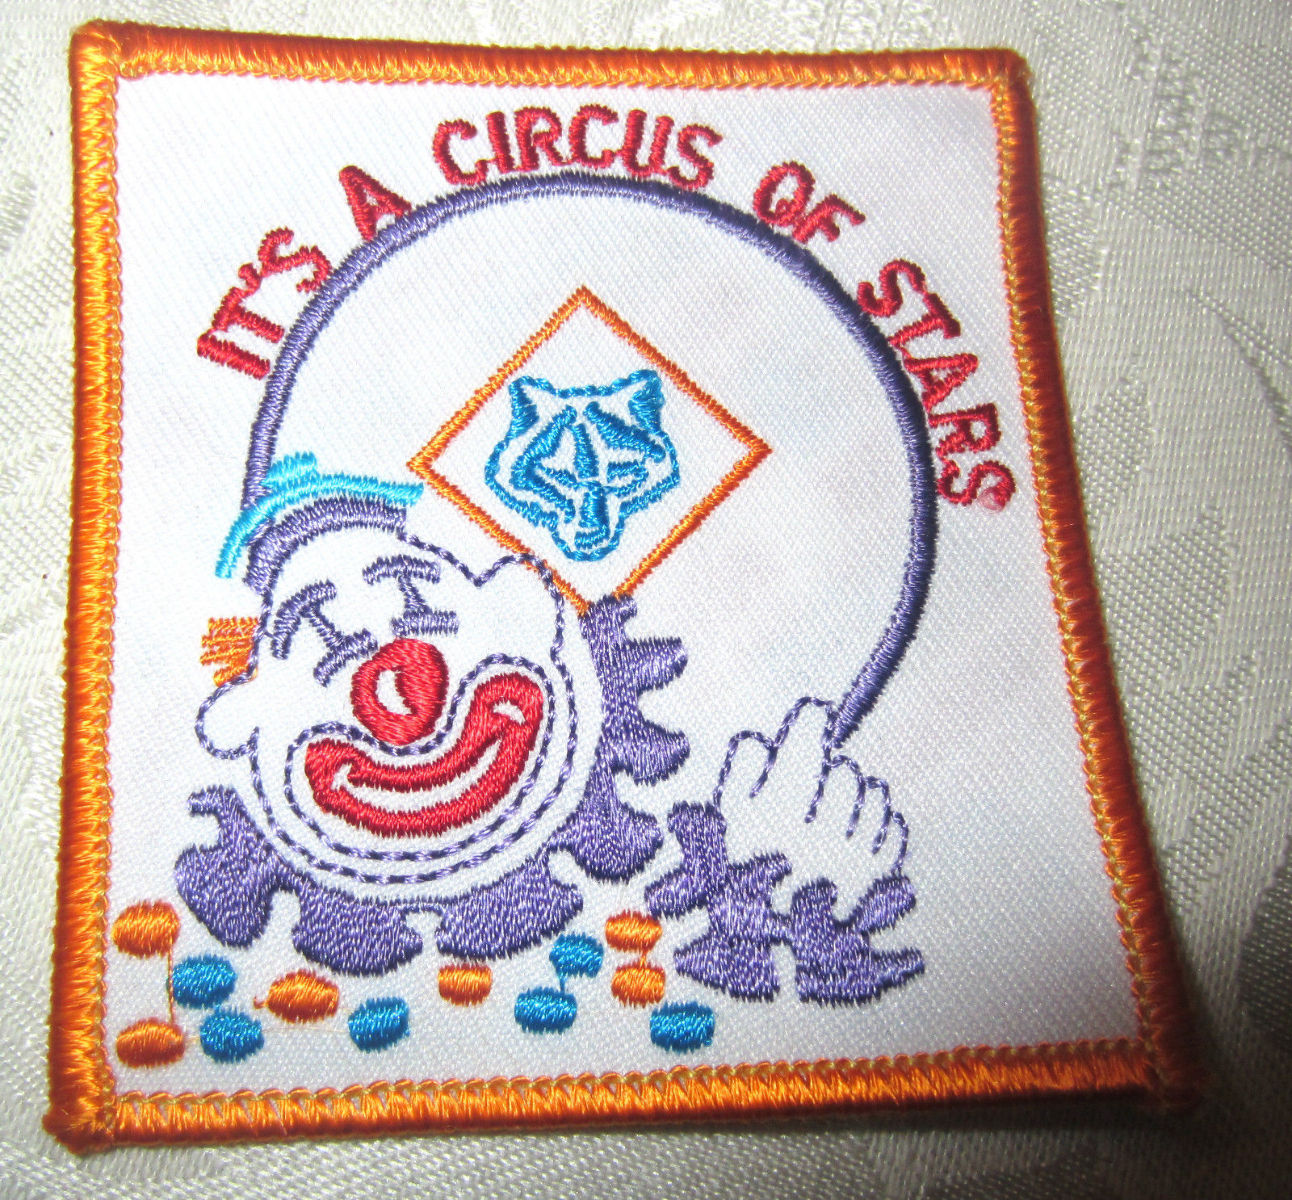 Bsa Boy Scout Uniform Patch Its A Circus Of Stars Clown